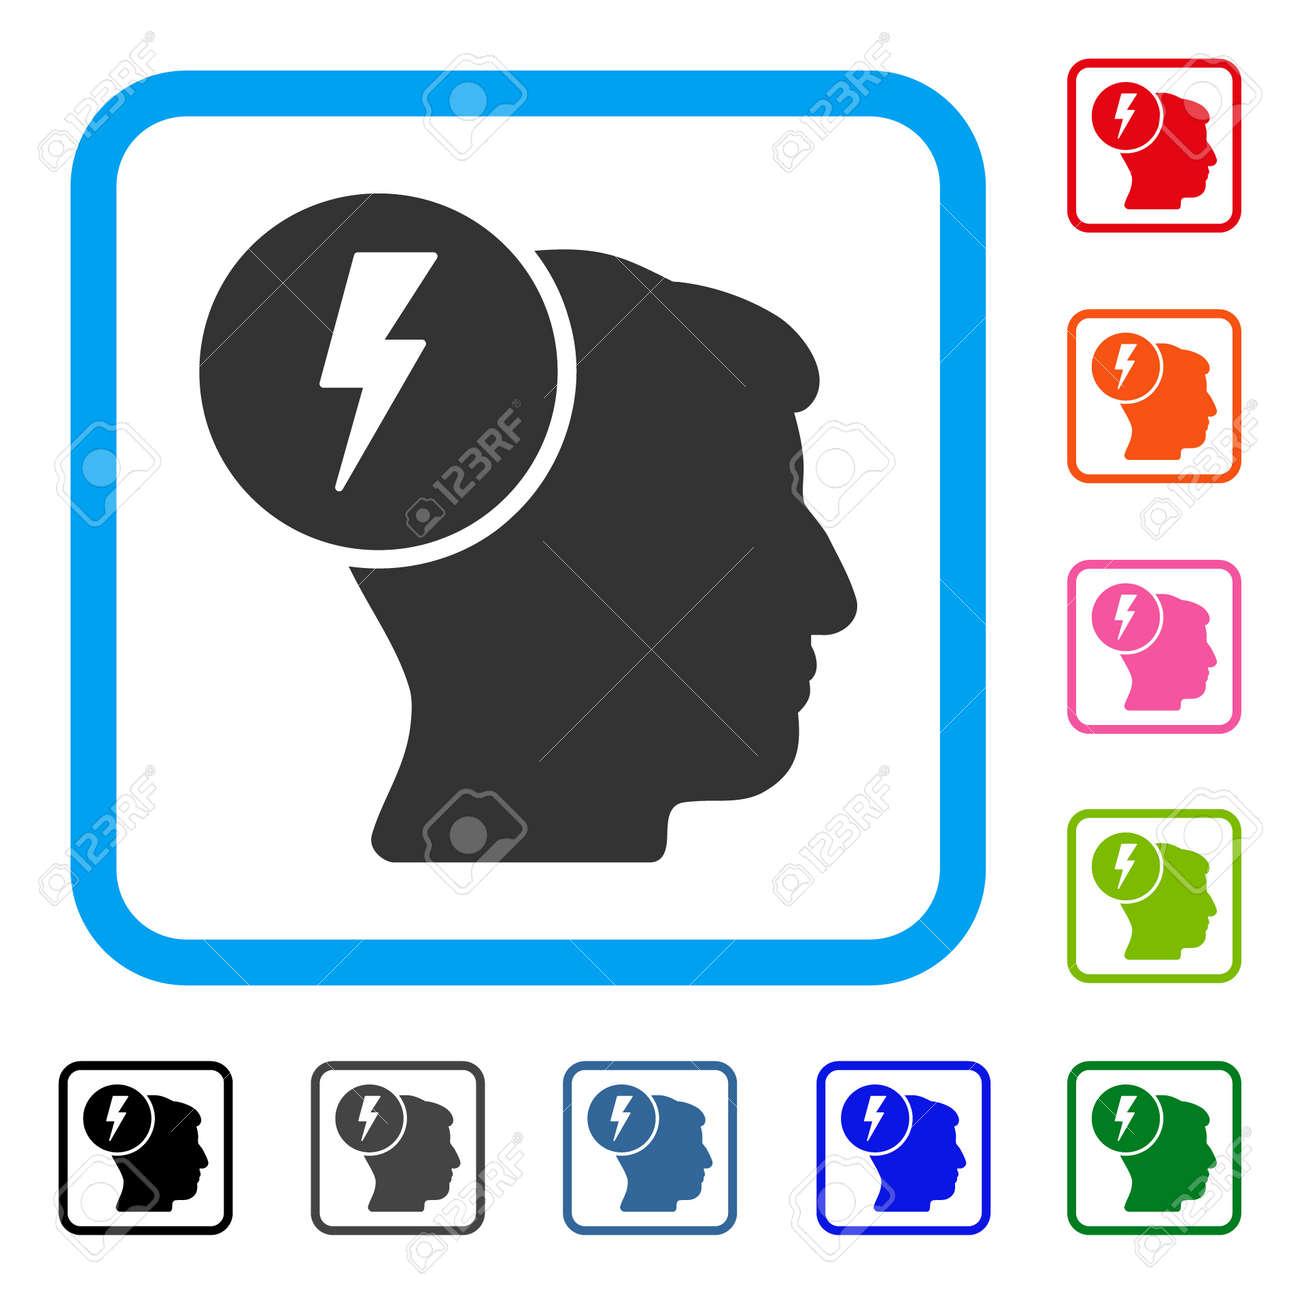 Generous Spdt Symbol Images - The Best Electrical Circuit Diagram ...